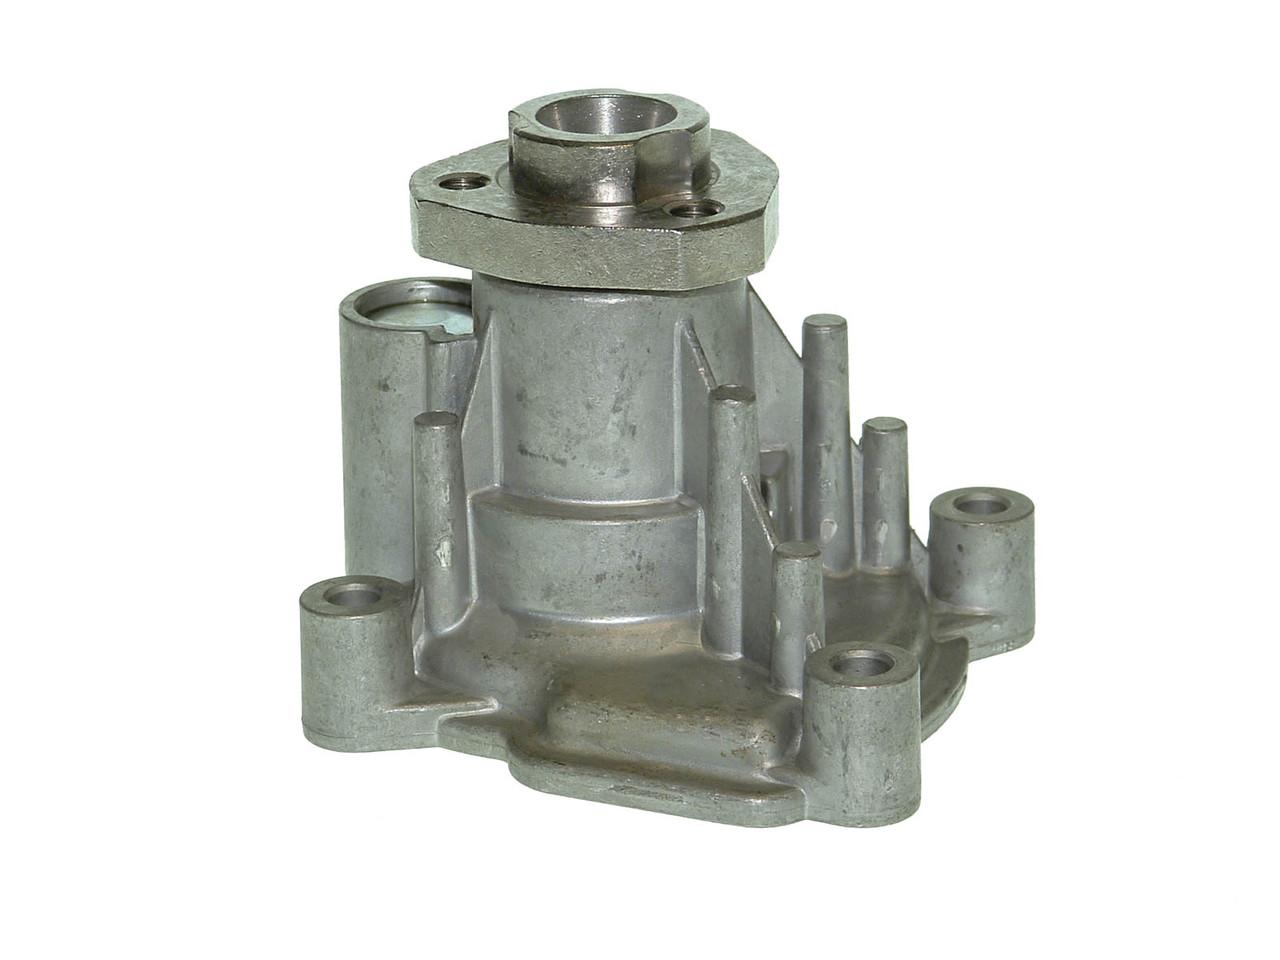 Водяной насос (помпа) Skoda Fabia 1.6 FSI 2003- Saleri SIL